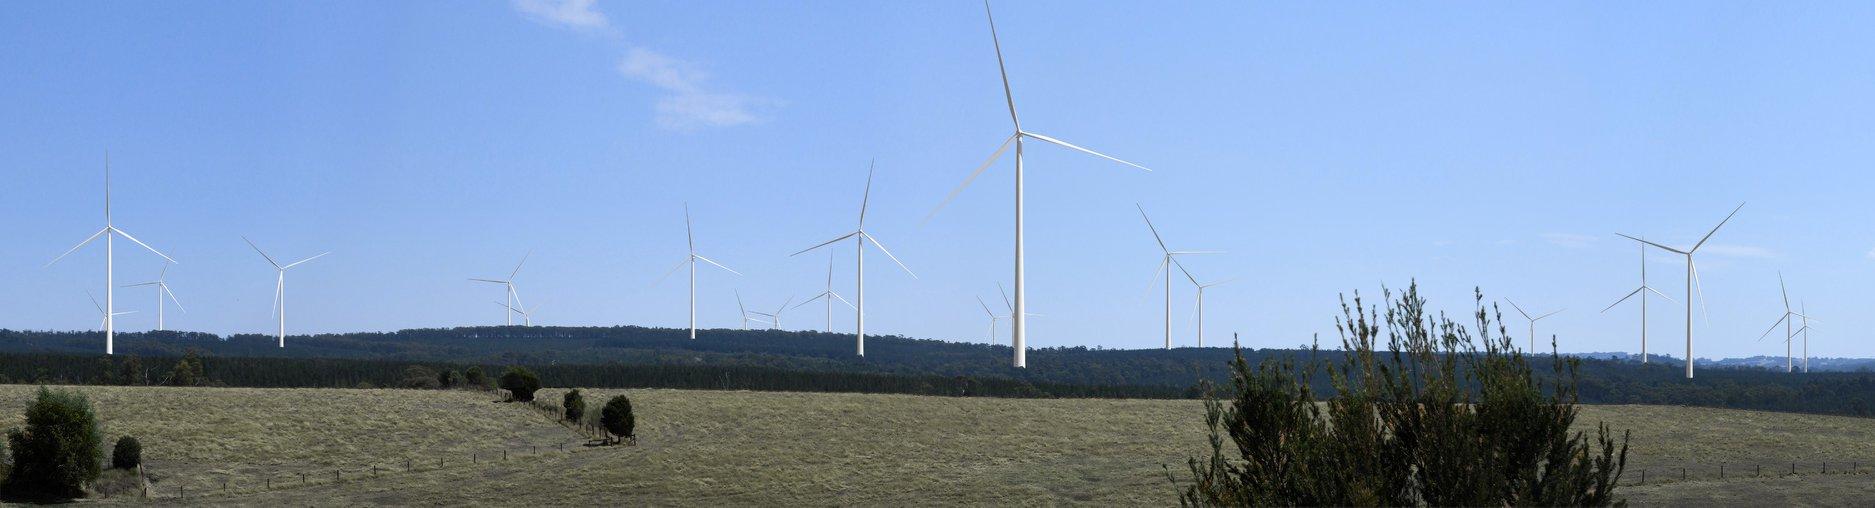 FoE Melb Delburn wind farm